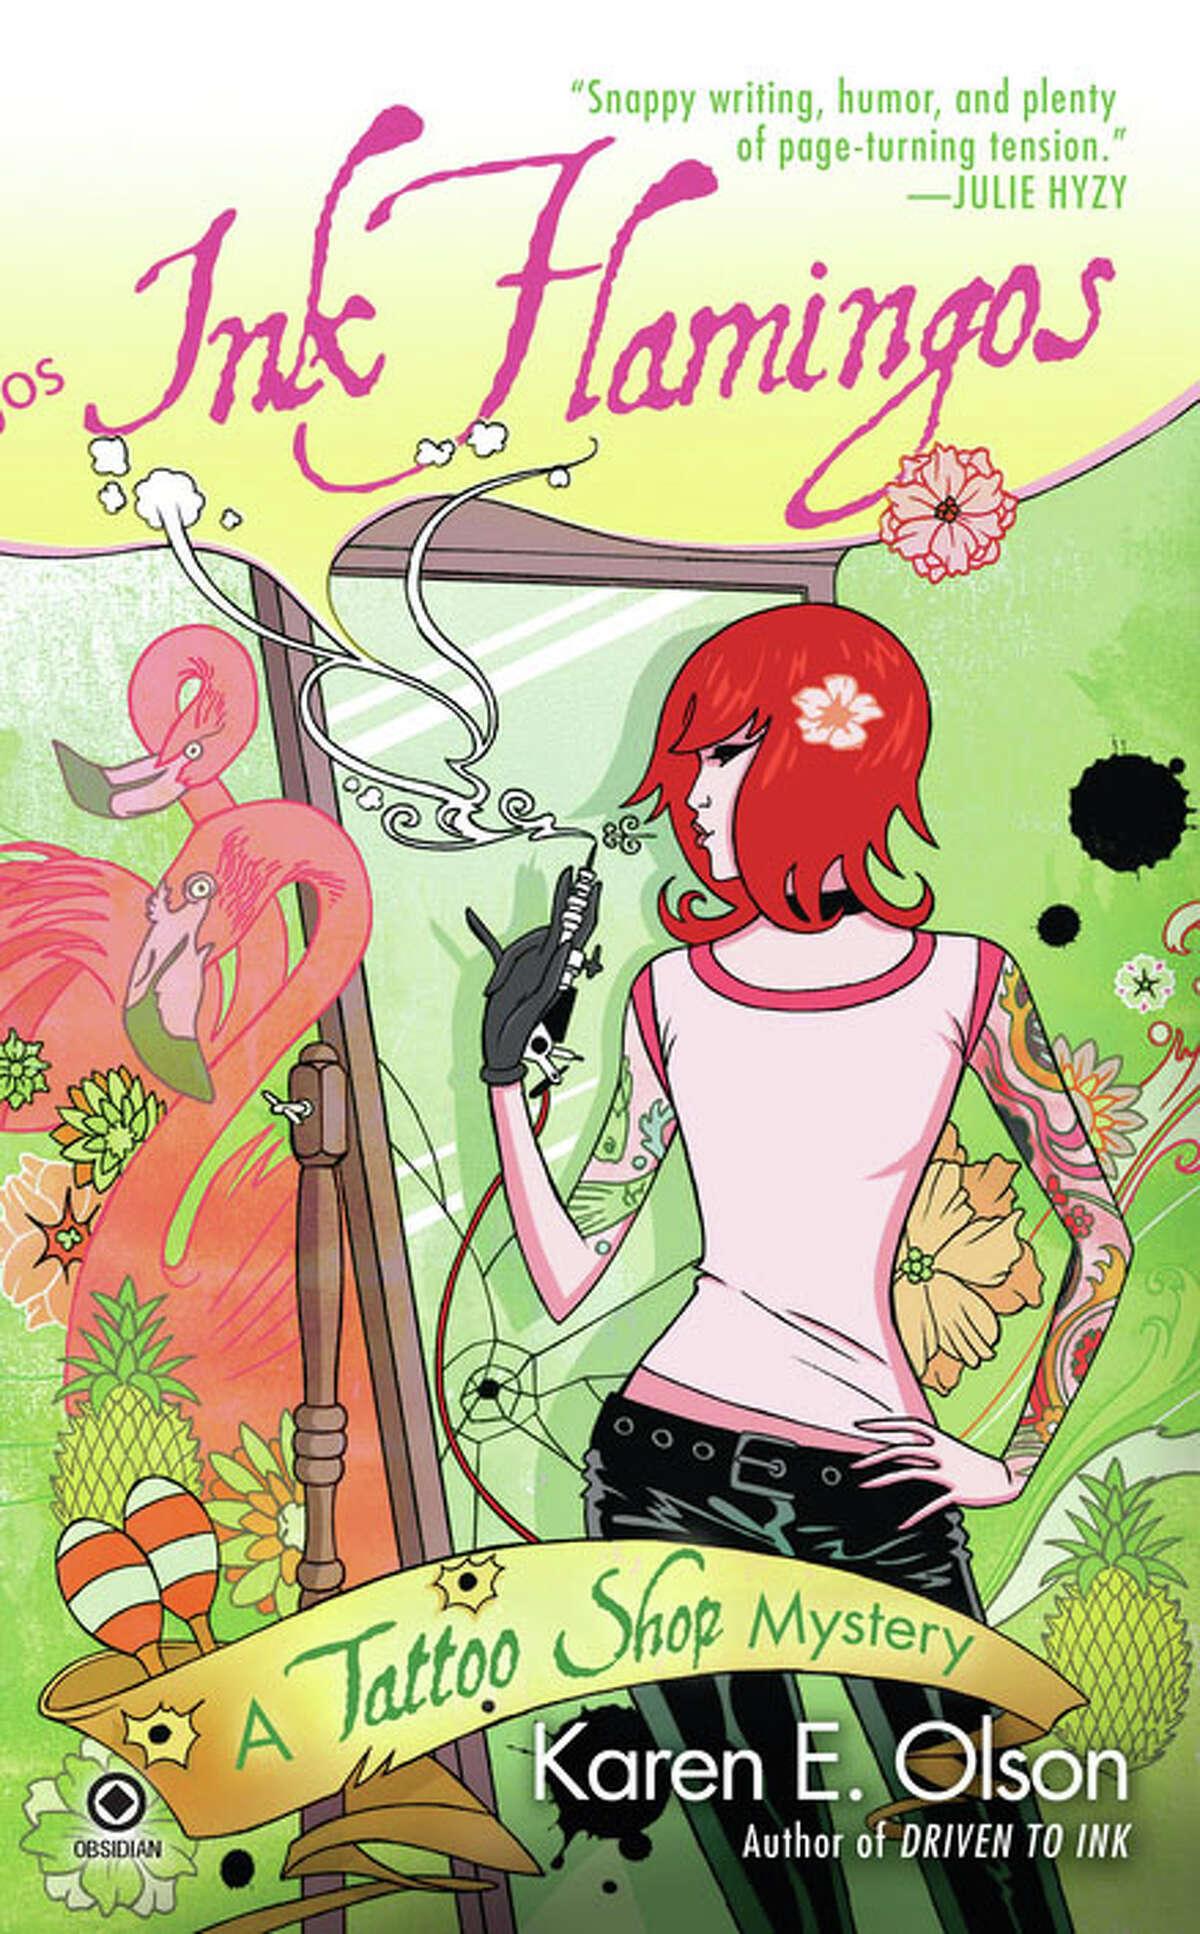 New Haven journalist Karen Olson has a new novel in her series about a Las Vegas tattoo artist.